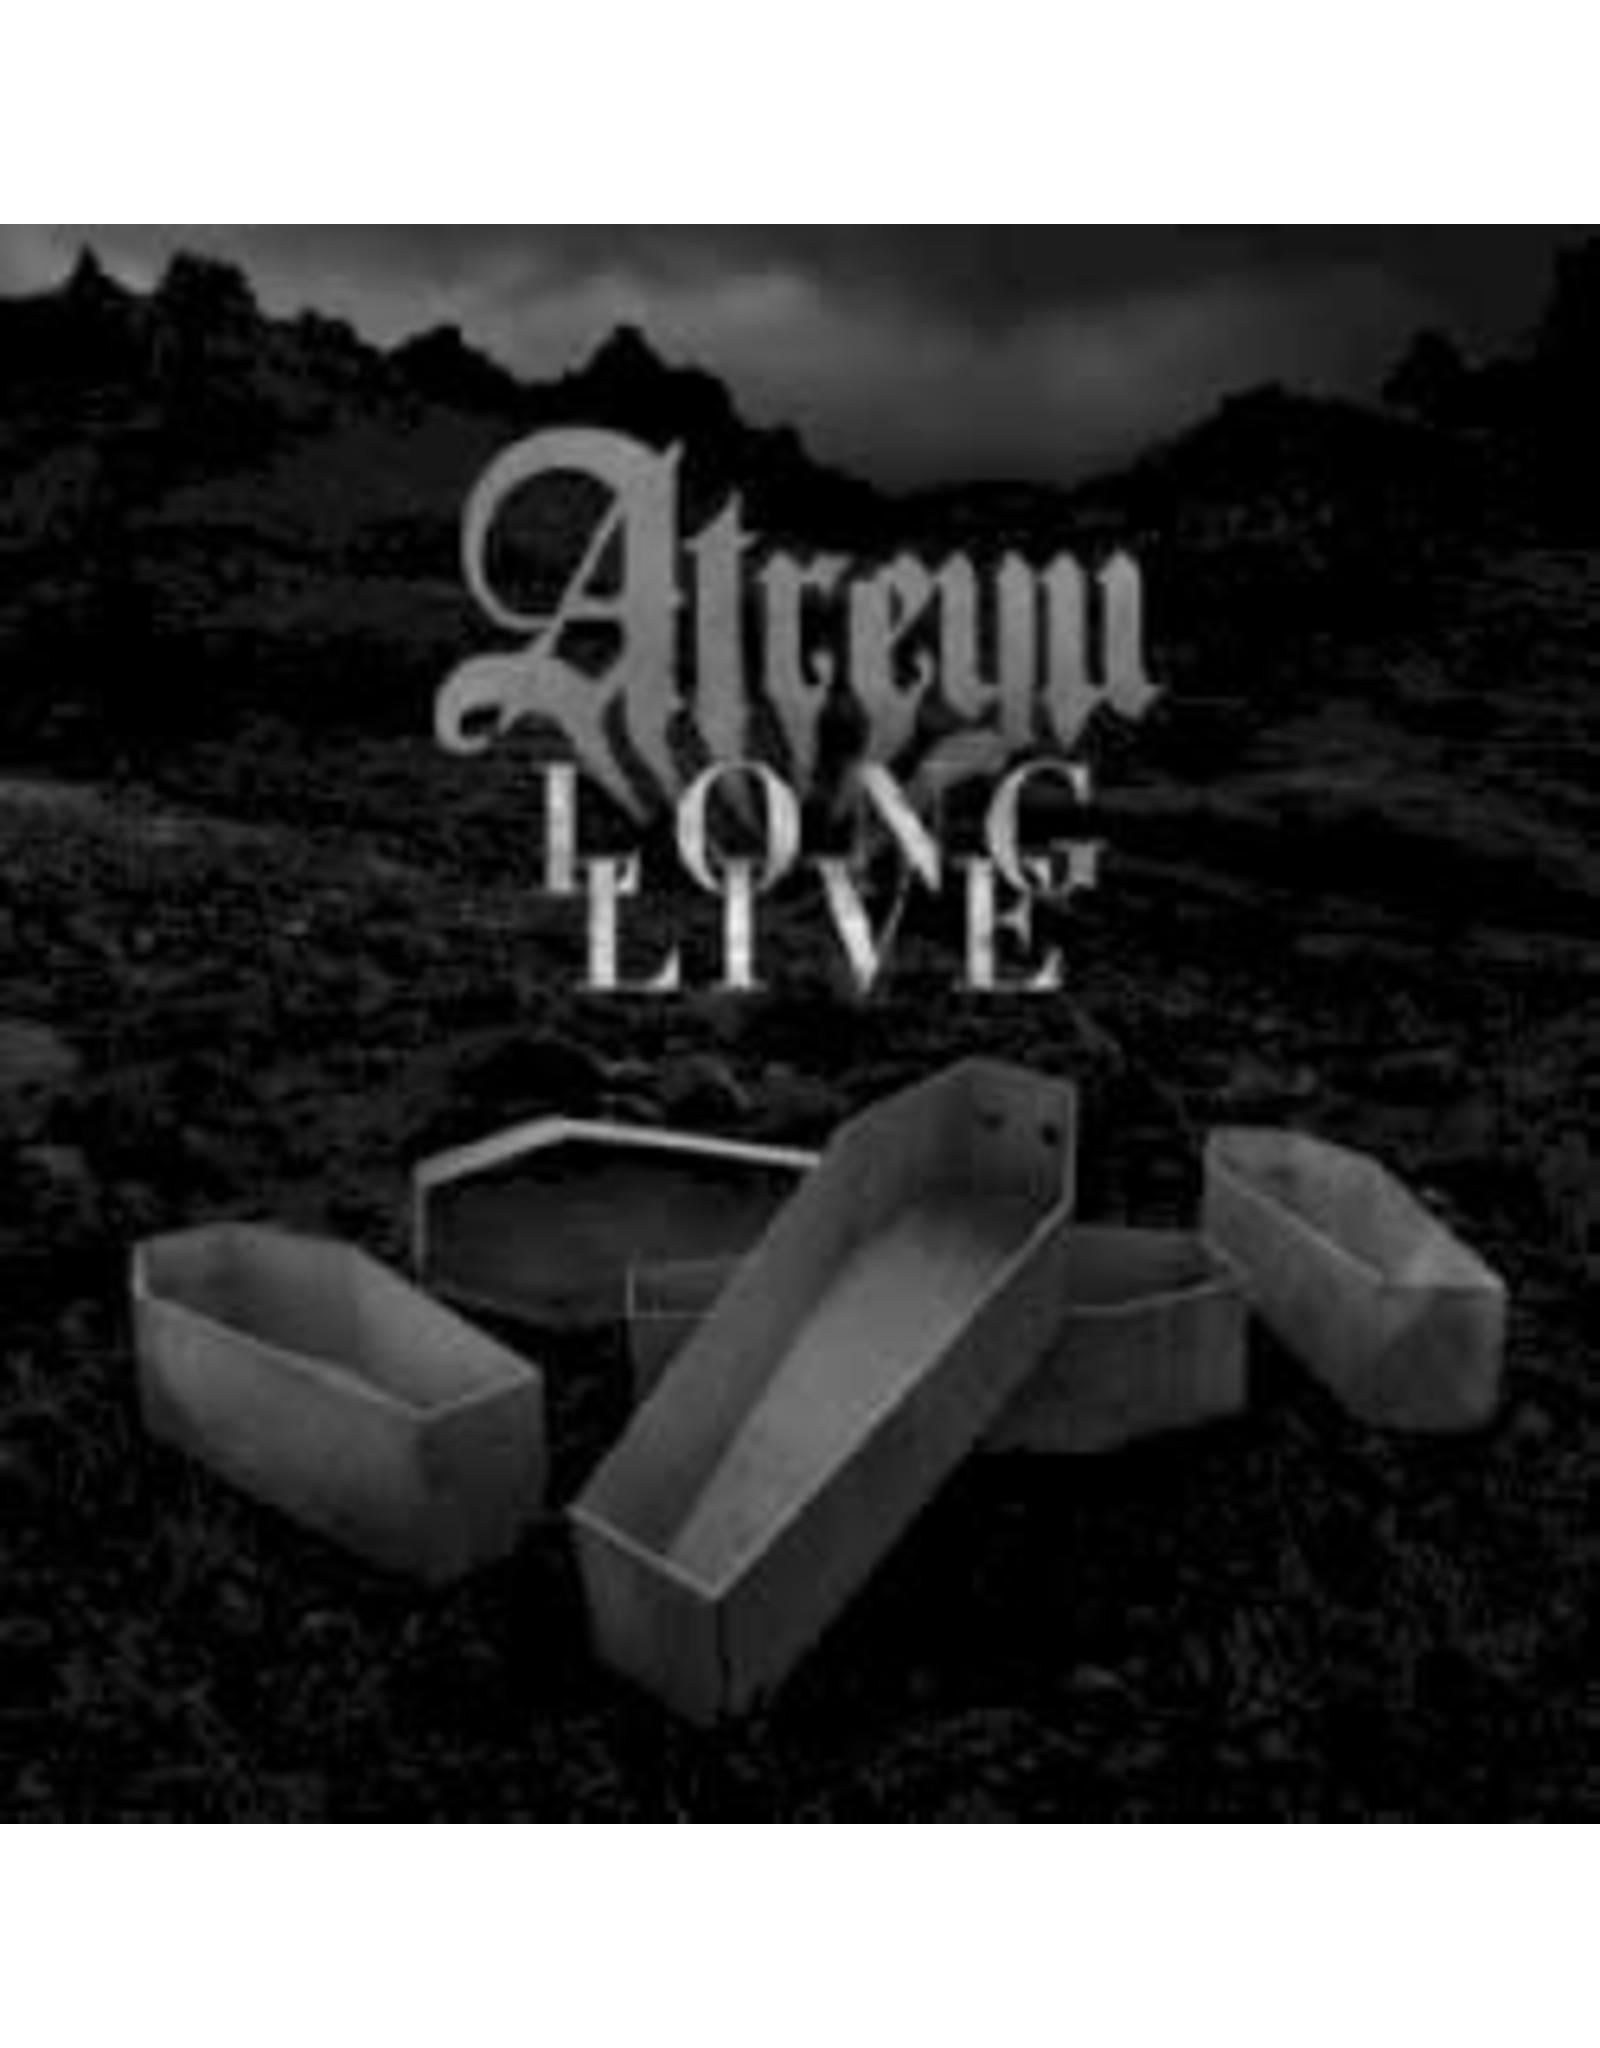 Atreyu - Long Live LP